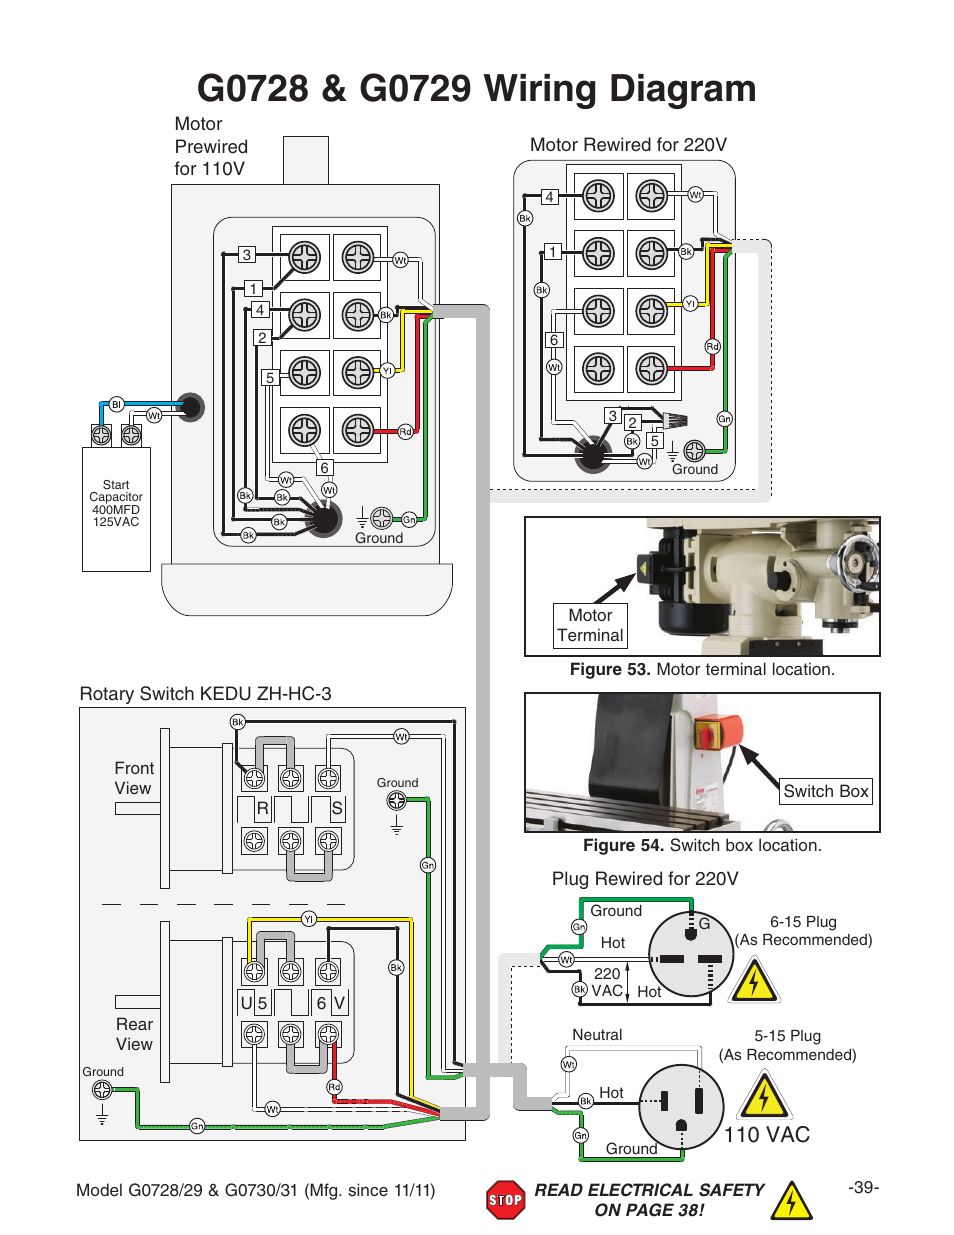 Electric Motor Wiring Diagram 110 To 220 from www.manualsdir.com